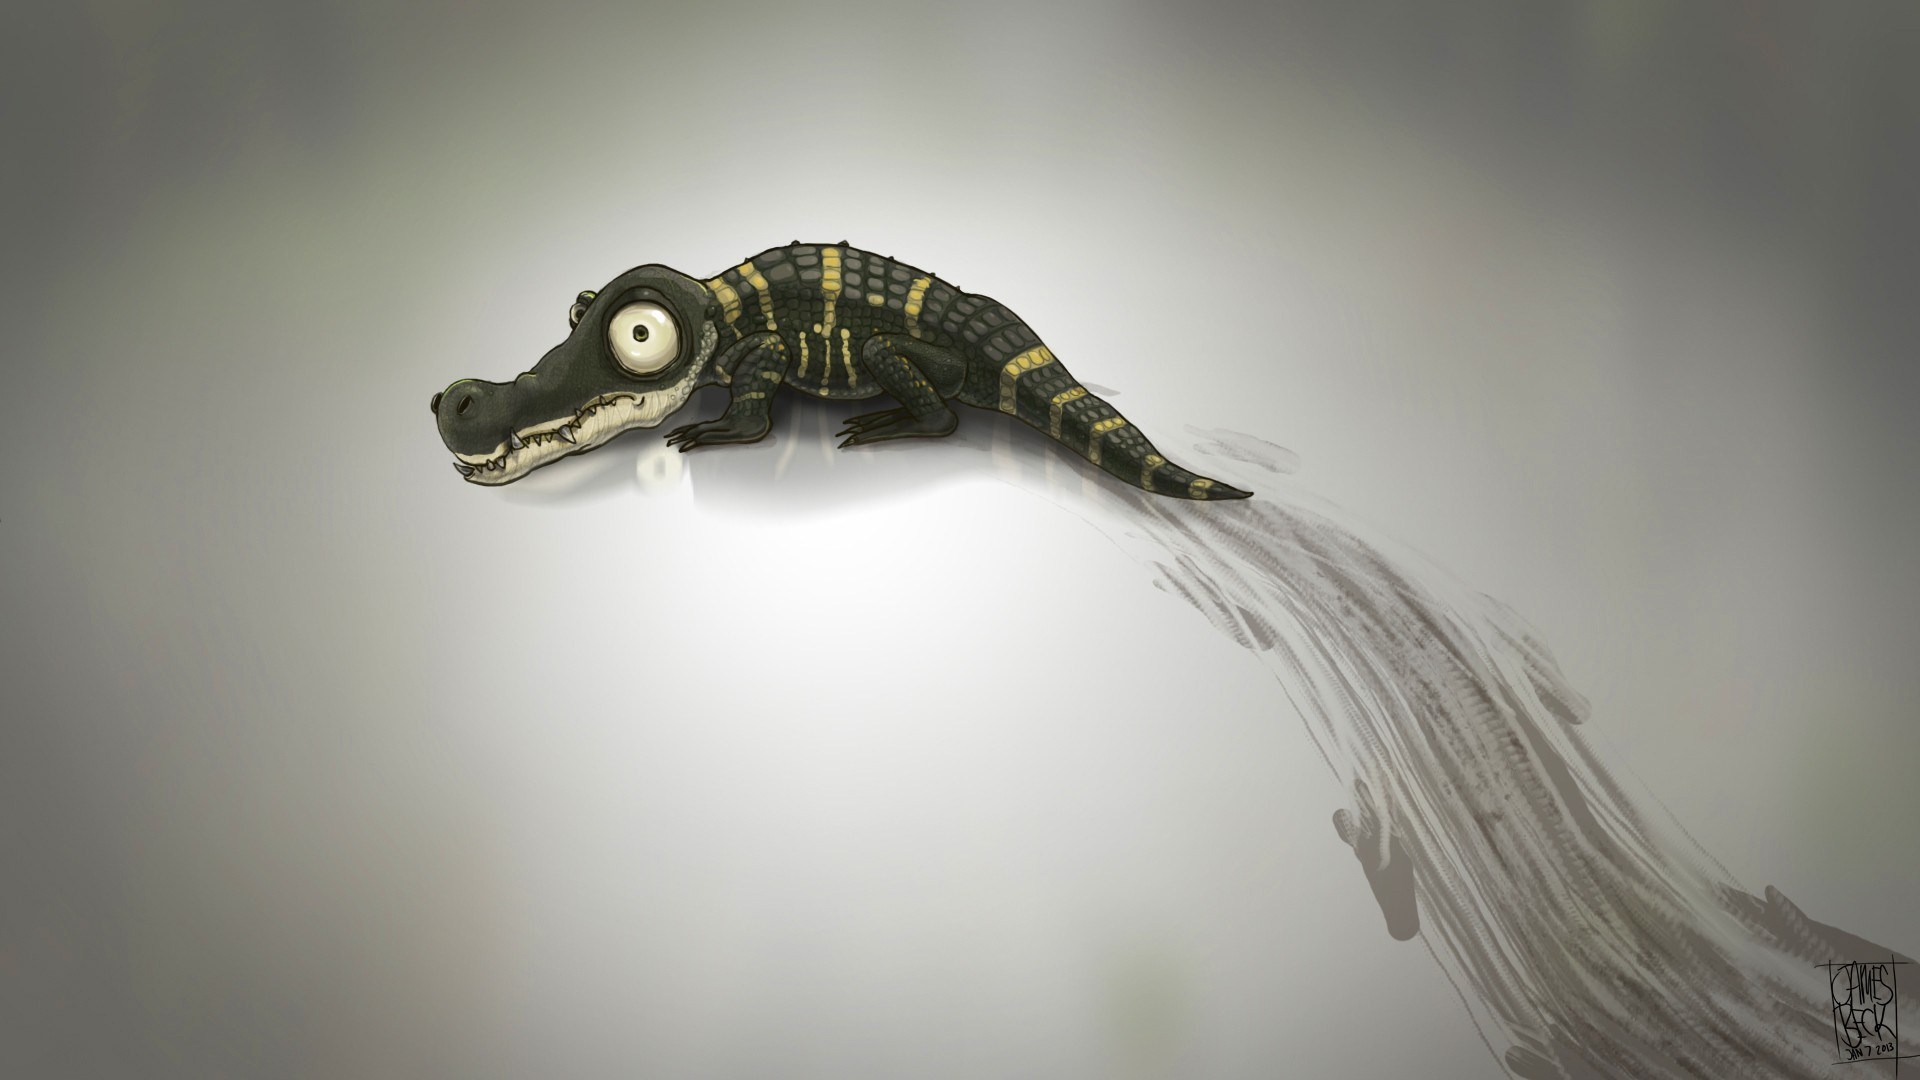 Related For Alligator Crocodile Green Minimalism Cartoon. Baby Alligator Minimalism Art